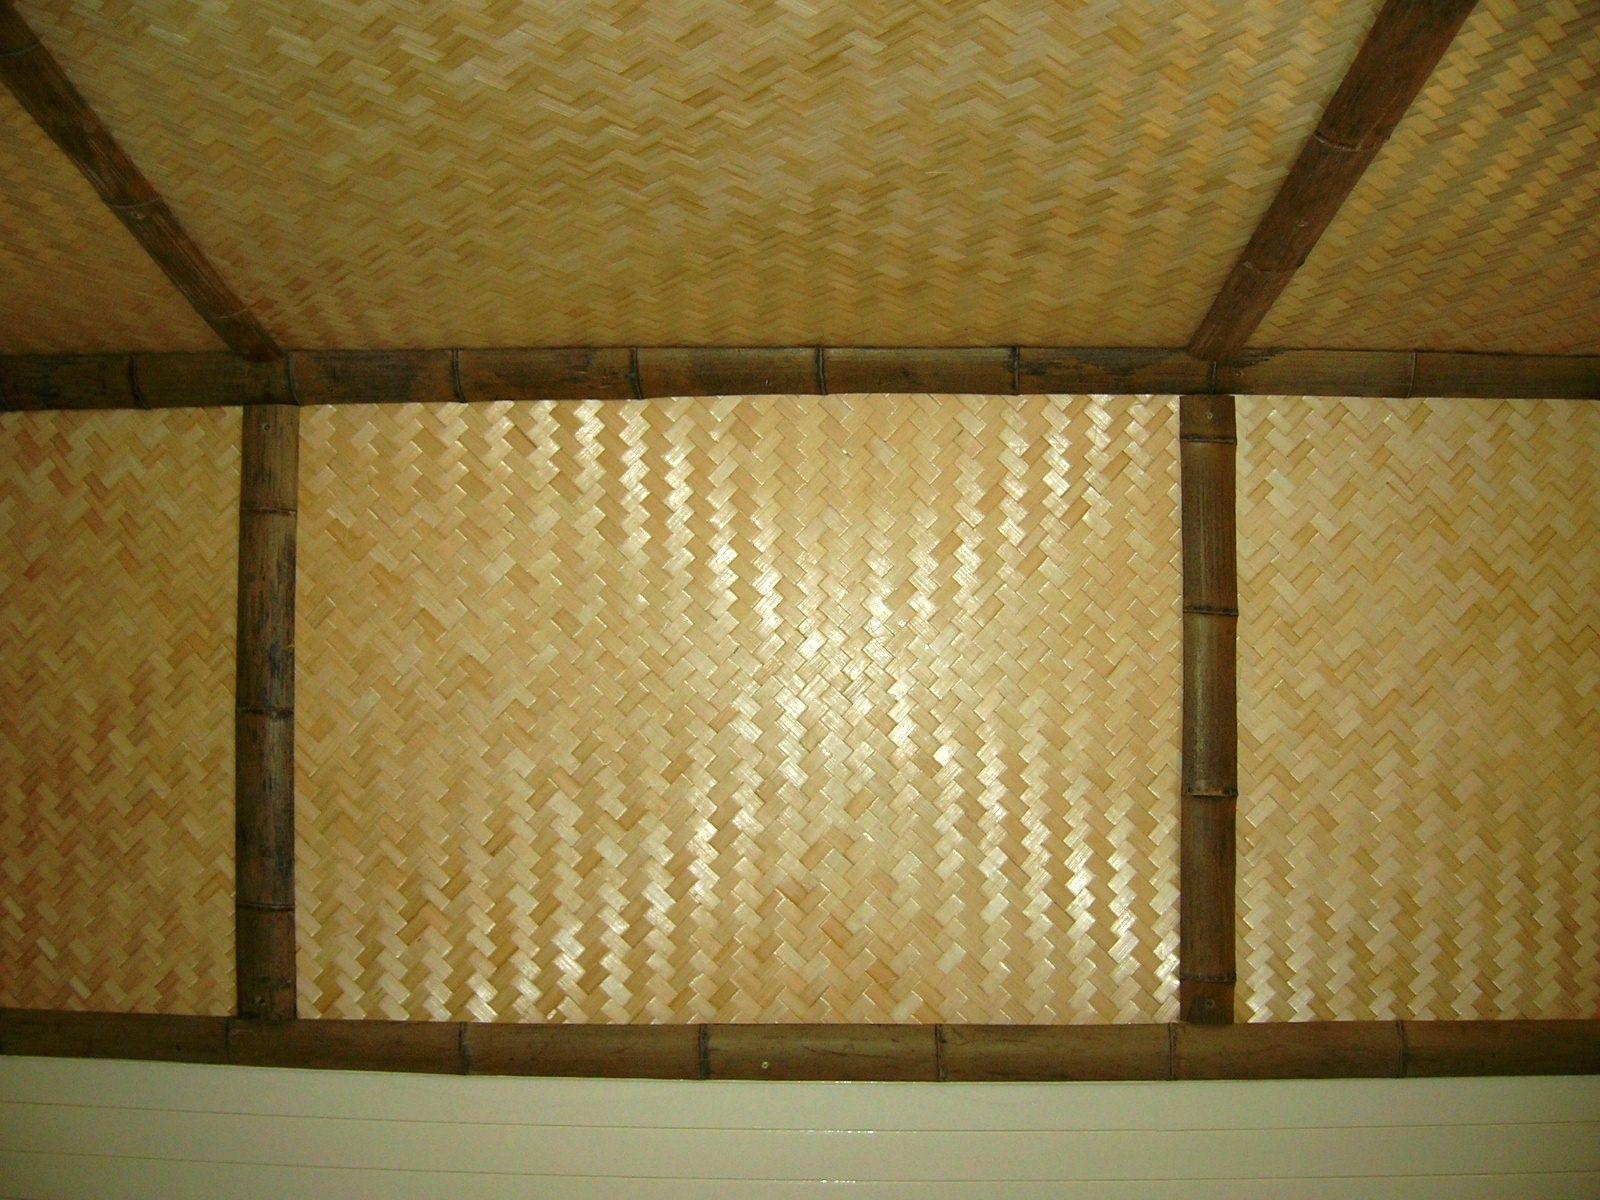 Bamboo Matting Ceiling